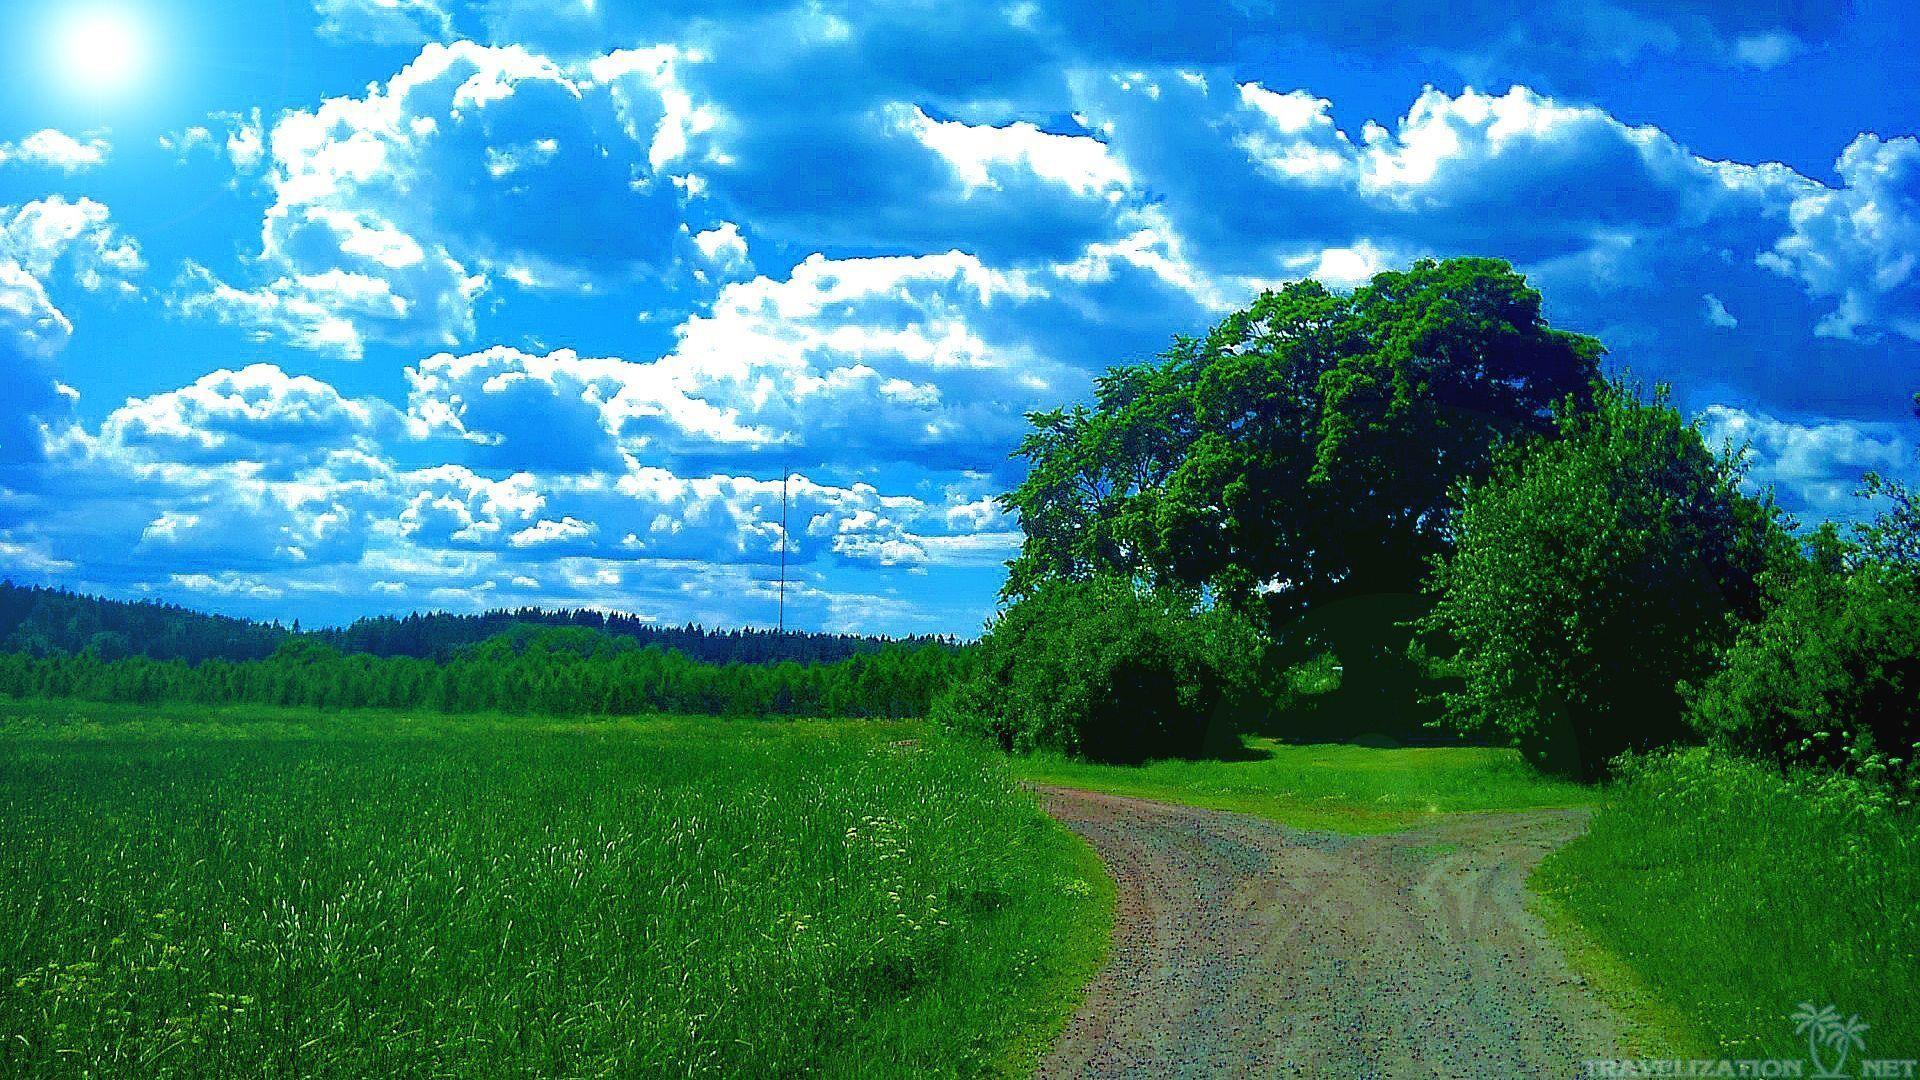 Data-src /w/full/a/4/f/343047 - High Resolution Summer Nature Background Hd - HD Wallpaper